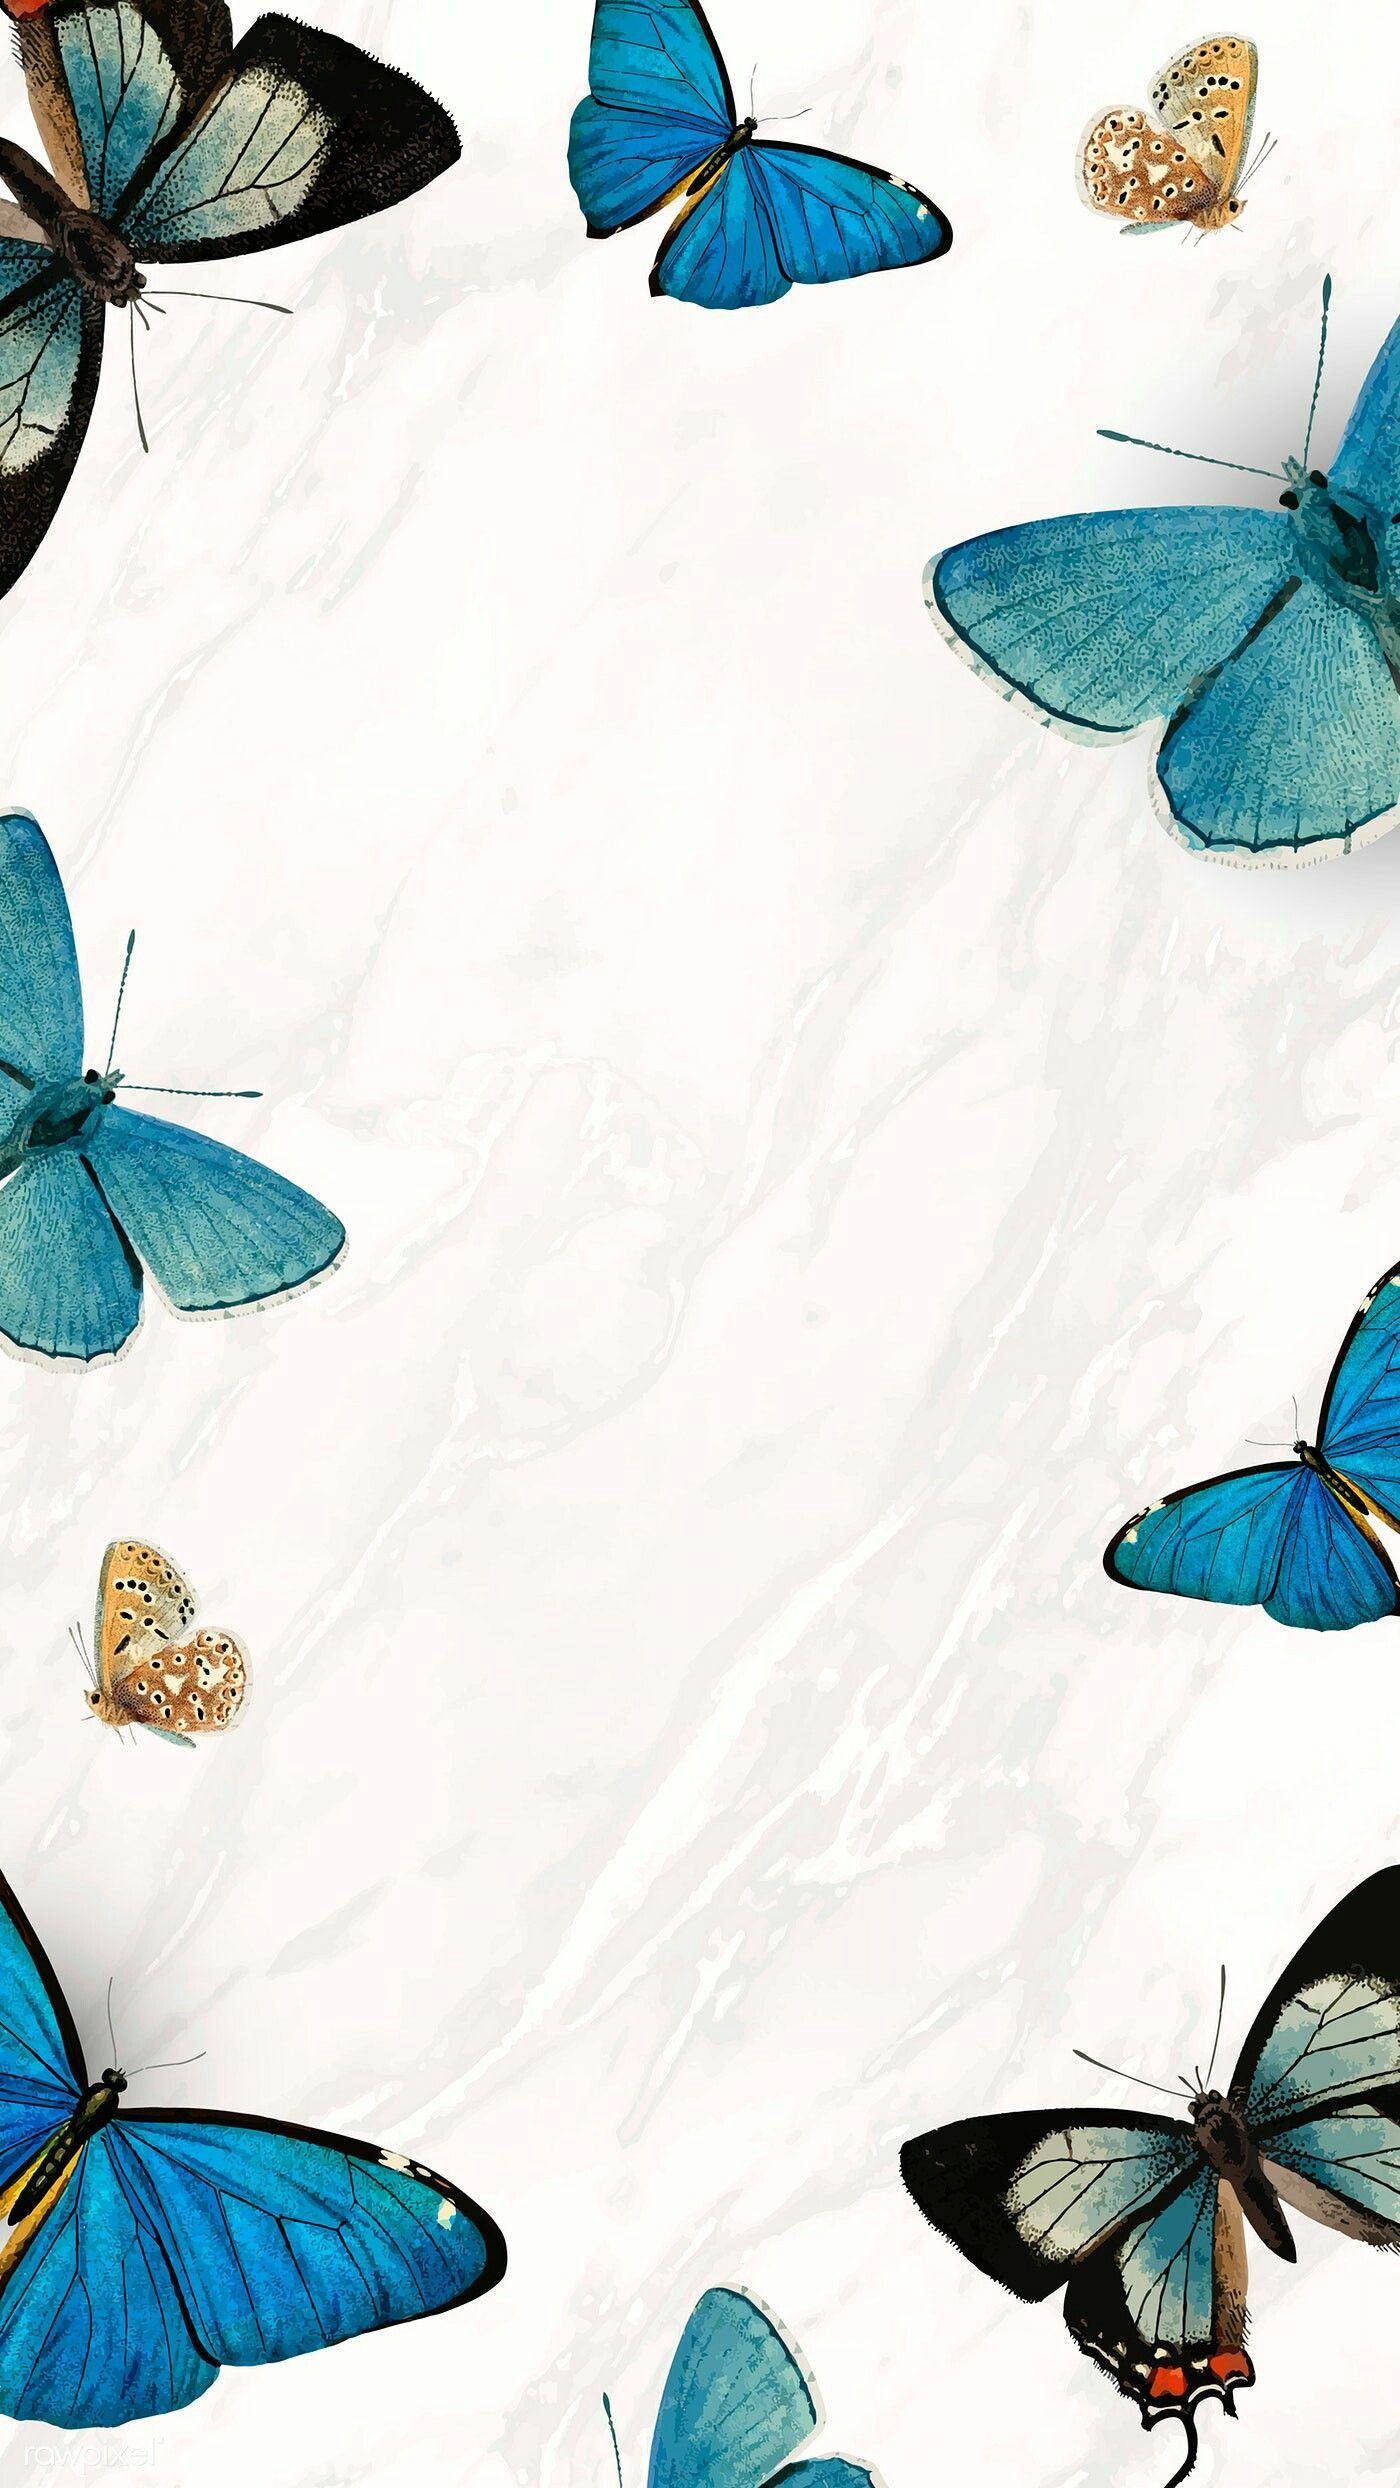 Papillons Bleus A Motifs Sur Mobile Blanc En 2020 Fond D Ecran Telephone Fond D Ecran Dessin Papillon Bleu